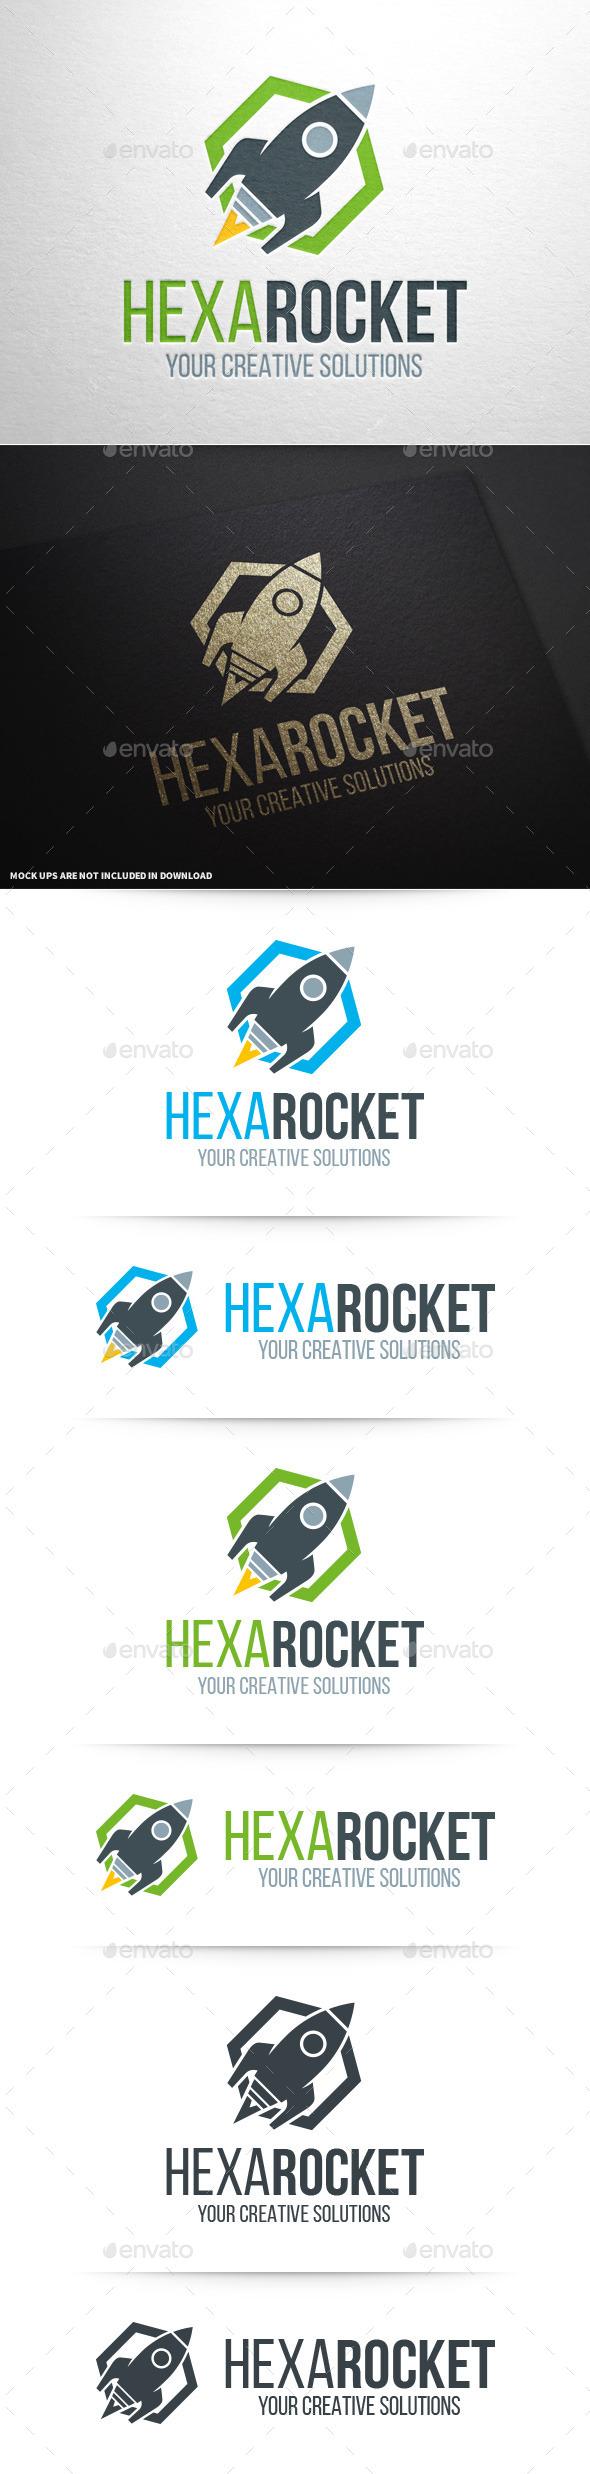 Hexa Rocket Logo Template